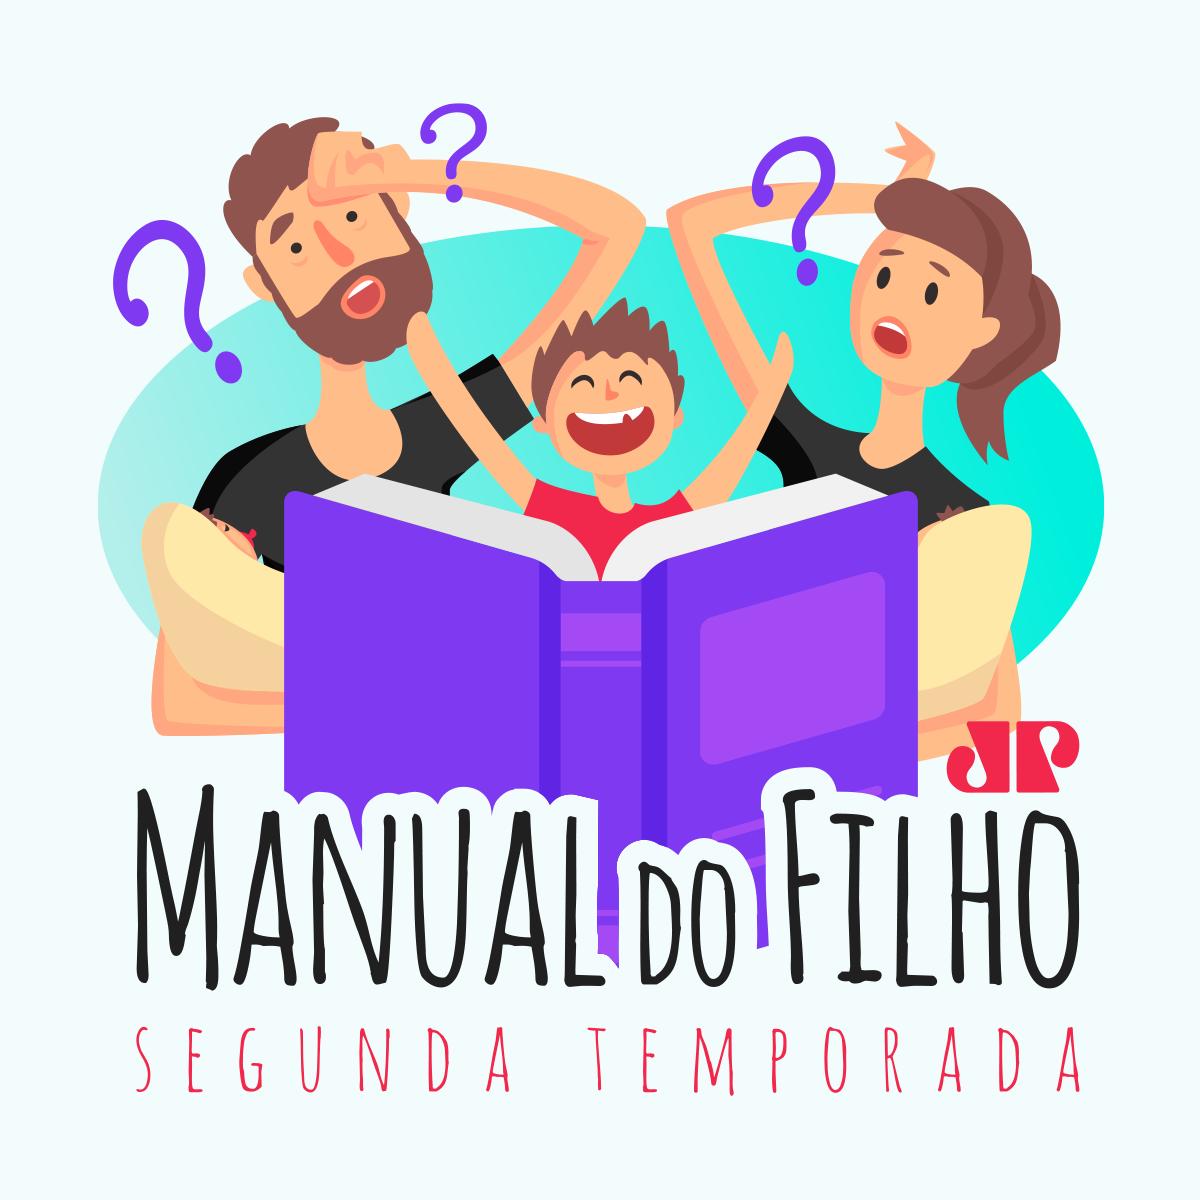 Manual do Filho